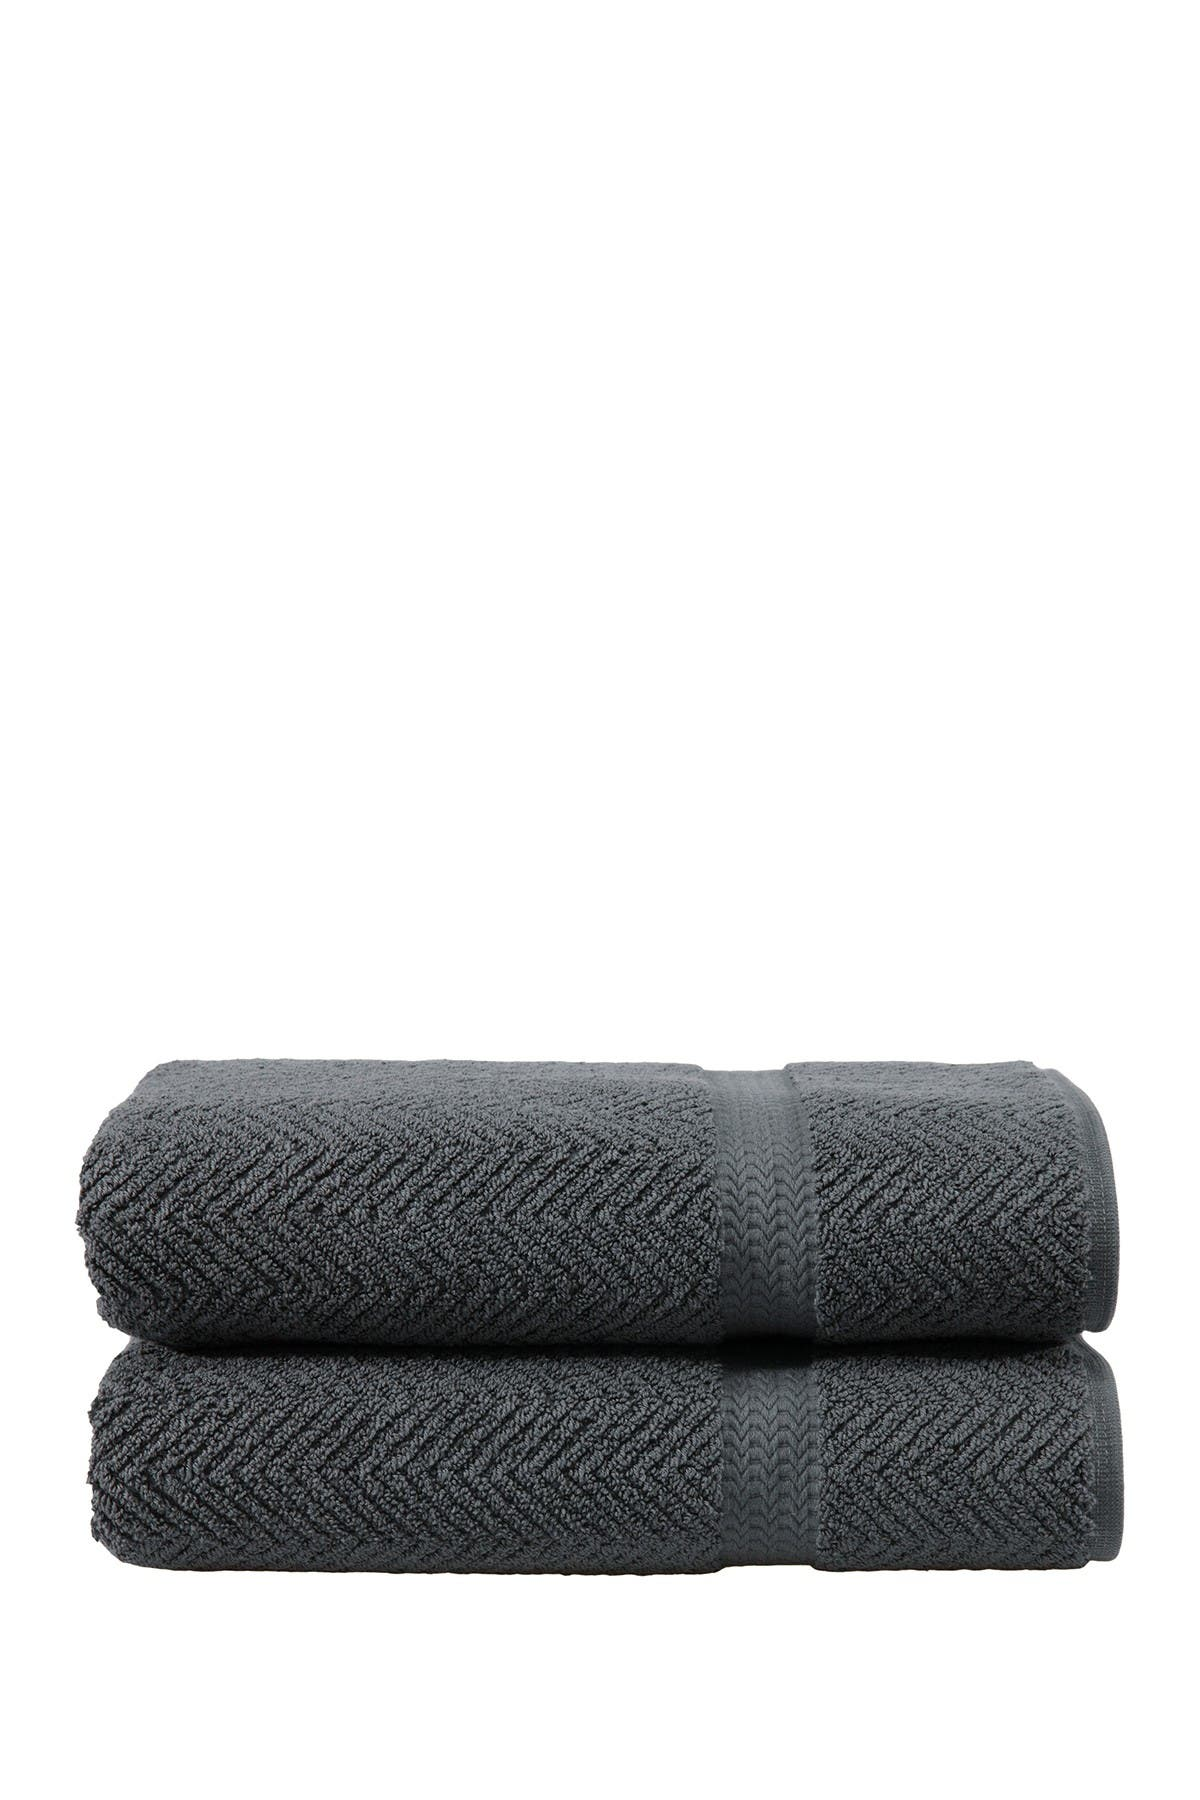 Image of LINUM HOME Grey Herringbone Bath Towels - Set of 2